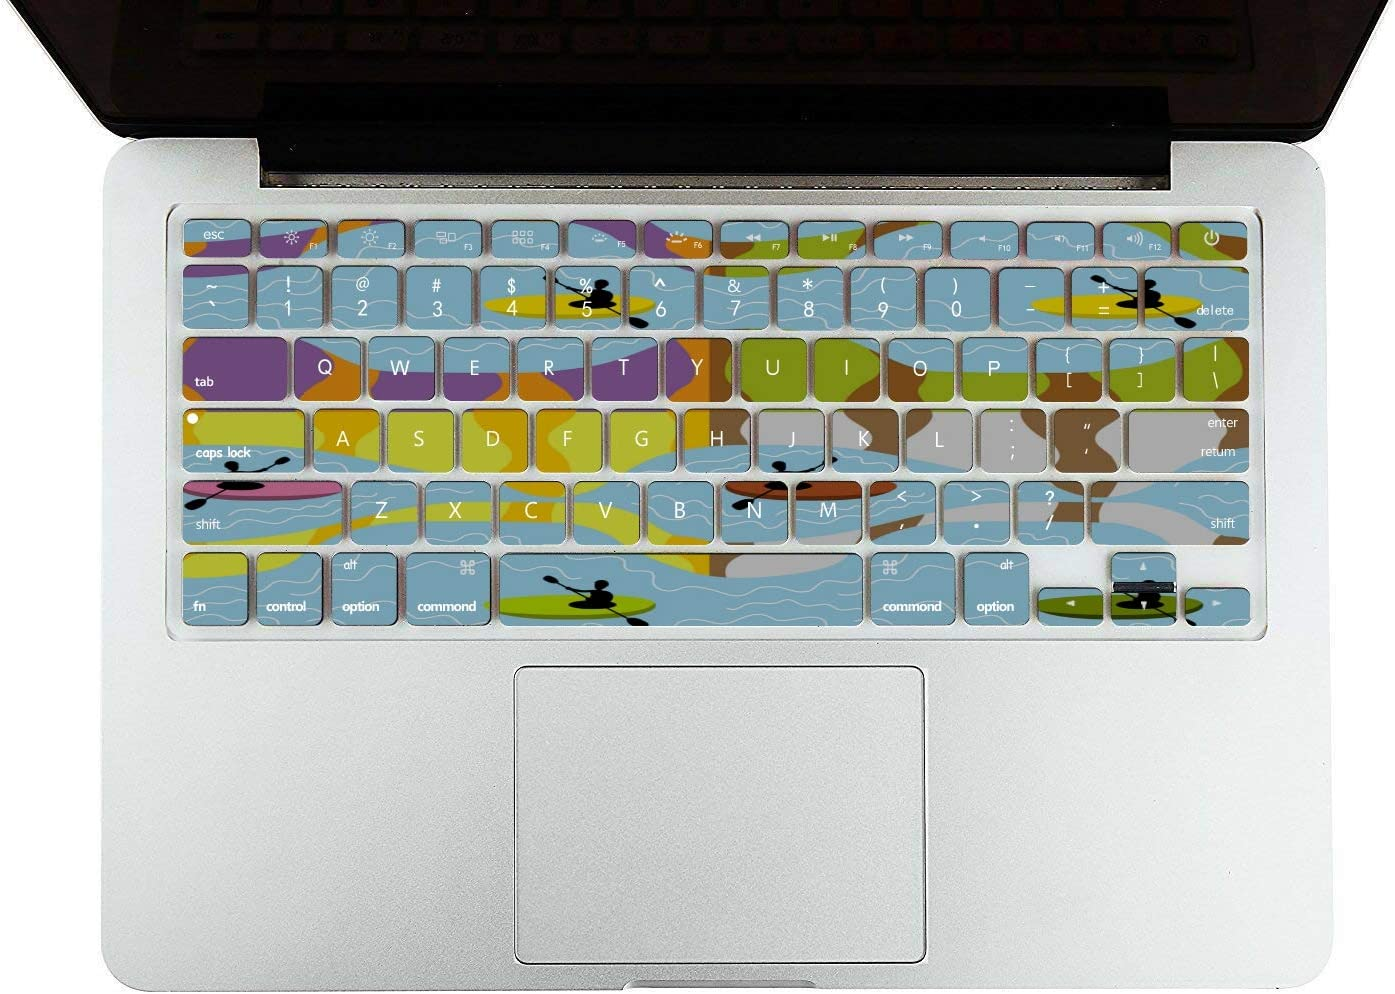 Mackbook Case Rowing Hand-Painting Sports Custom Plastic Hard Shell Compatible Mac Air 11 Pro 13 15 MacBook Pro Protective Case Protection for MacBook 2016-2019 Version